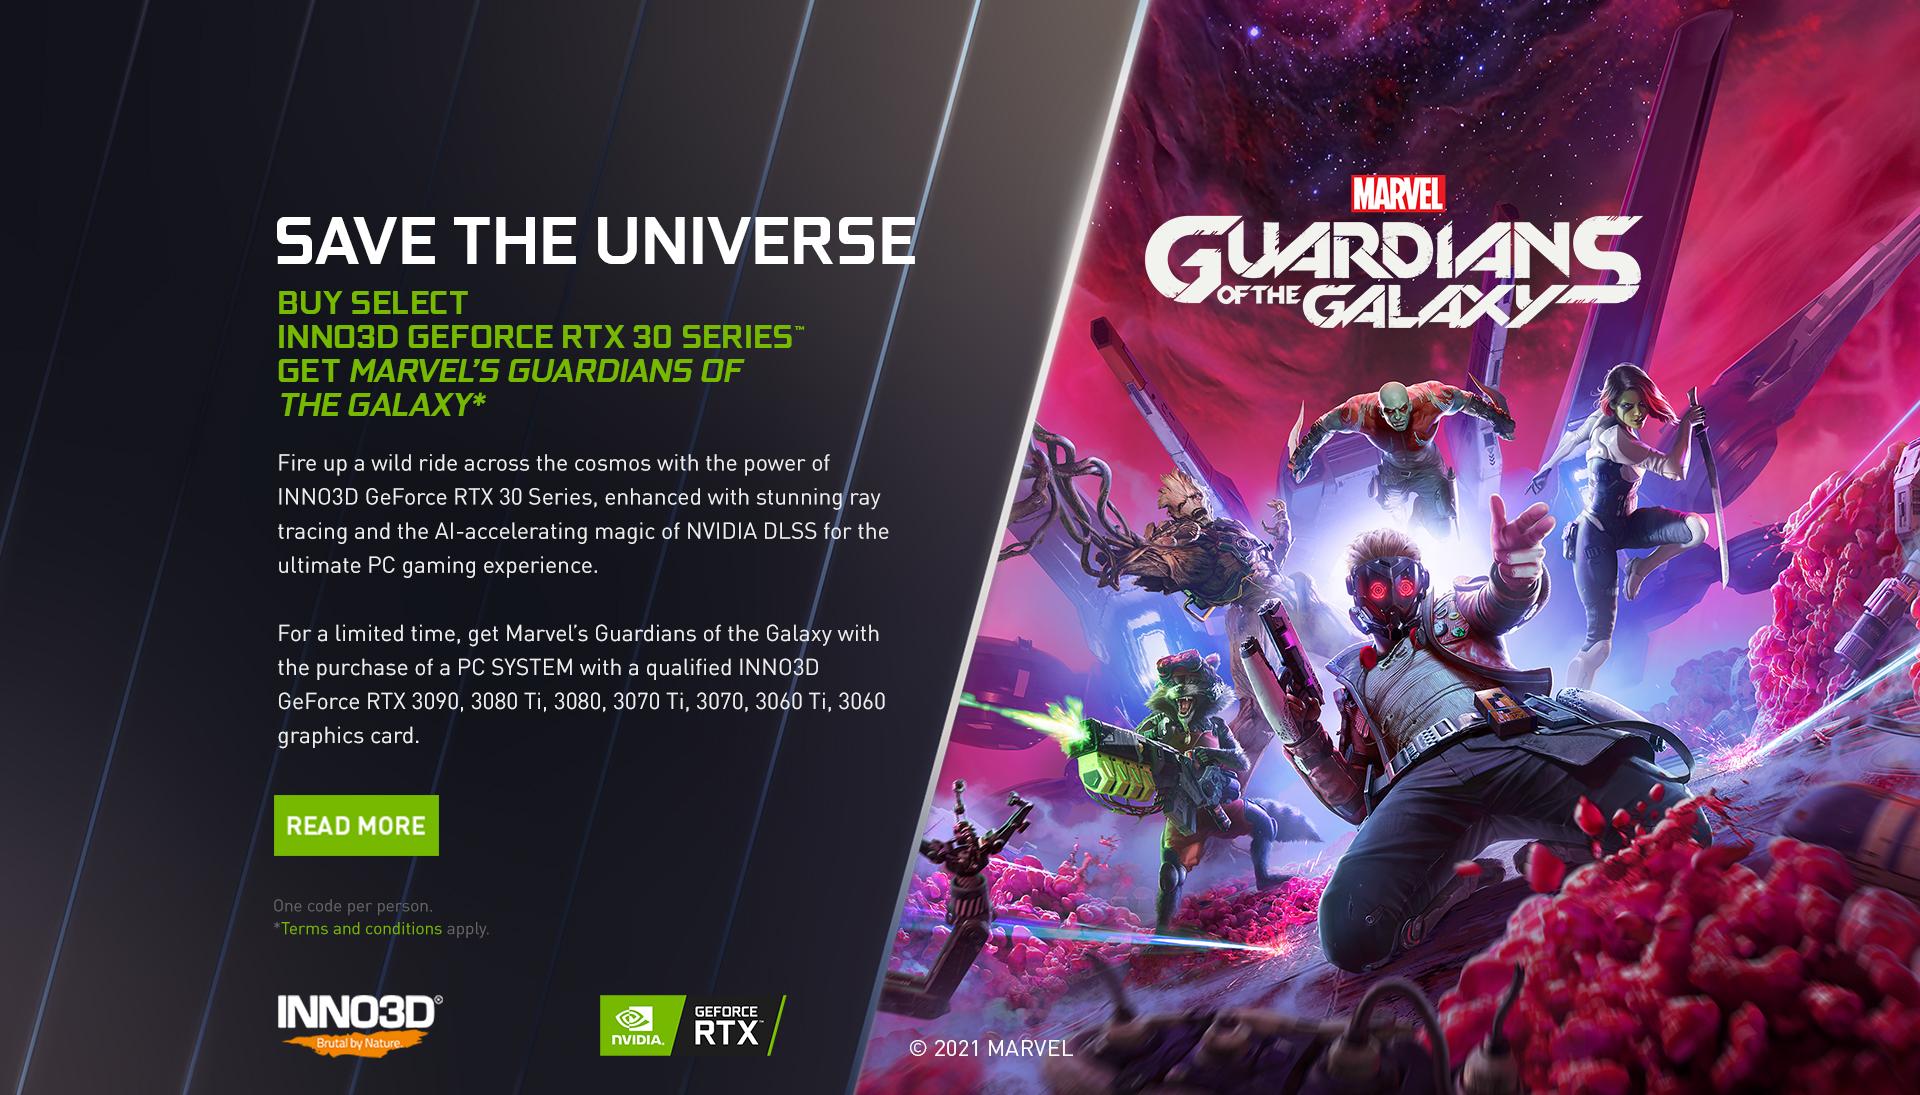 LP_Guardians_of_the_Galaxy-bundle_1920w_01.jpg (1.09 MB)